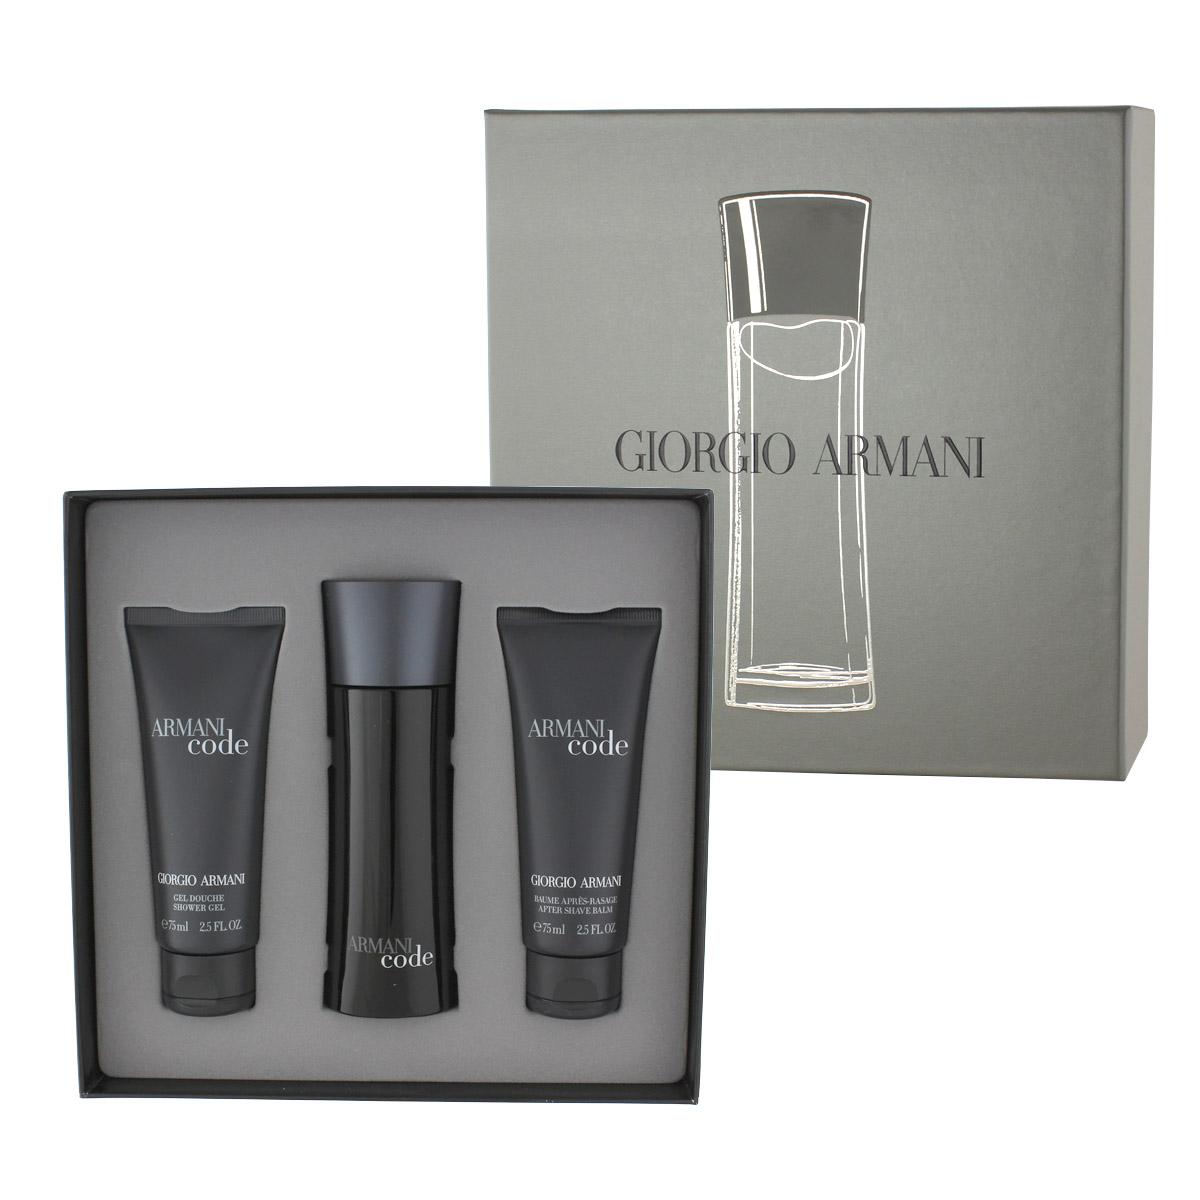 Armani Giorgio Code Homme EDT 75 ml + ASB 75 ml + SG 75 ml M